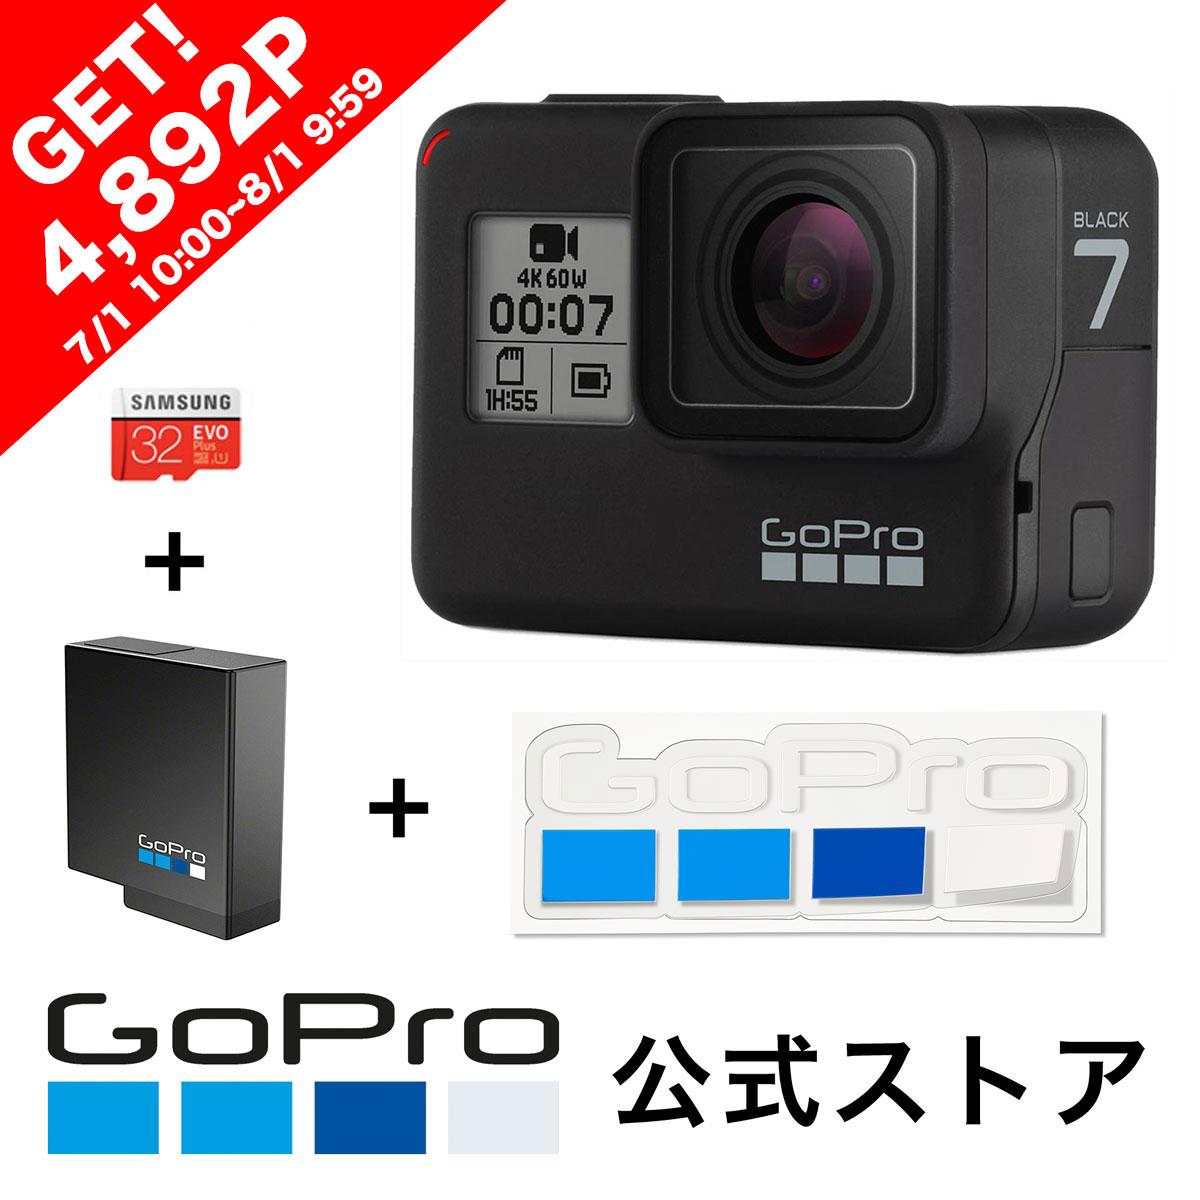 GoPro 楽天公式ストア